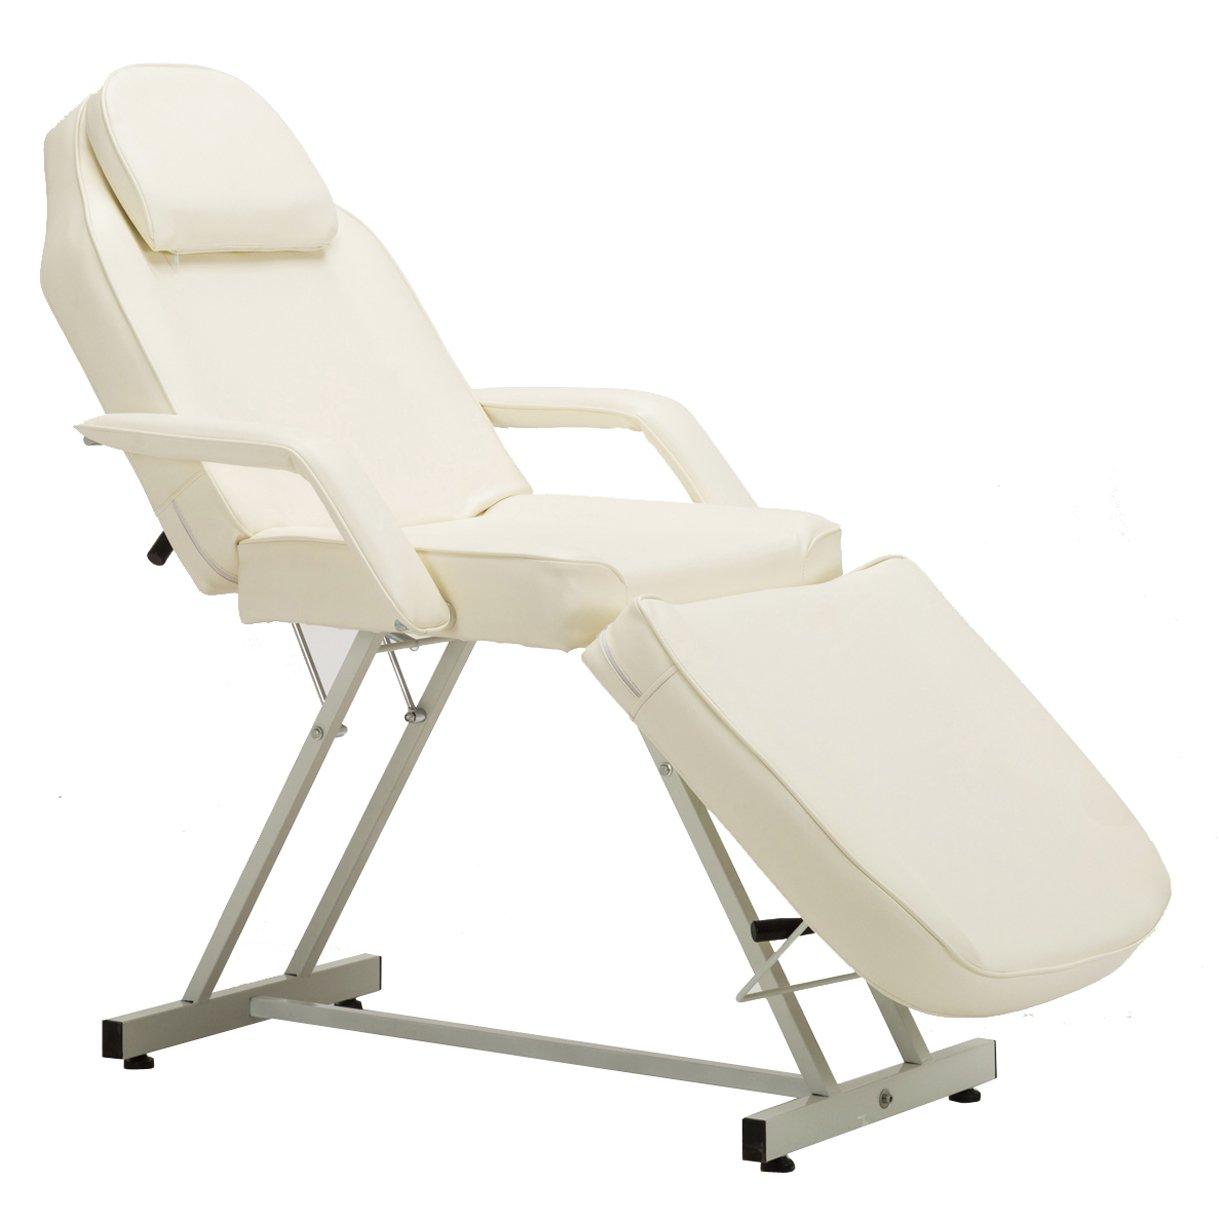 BarberPub 72 inches Adjustable Massage Table Multi-Purpose Salon SPA Beauty Bed Facial Tattoo Table Bed,0015 (Creme White)